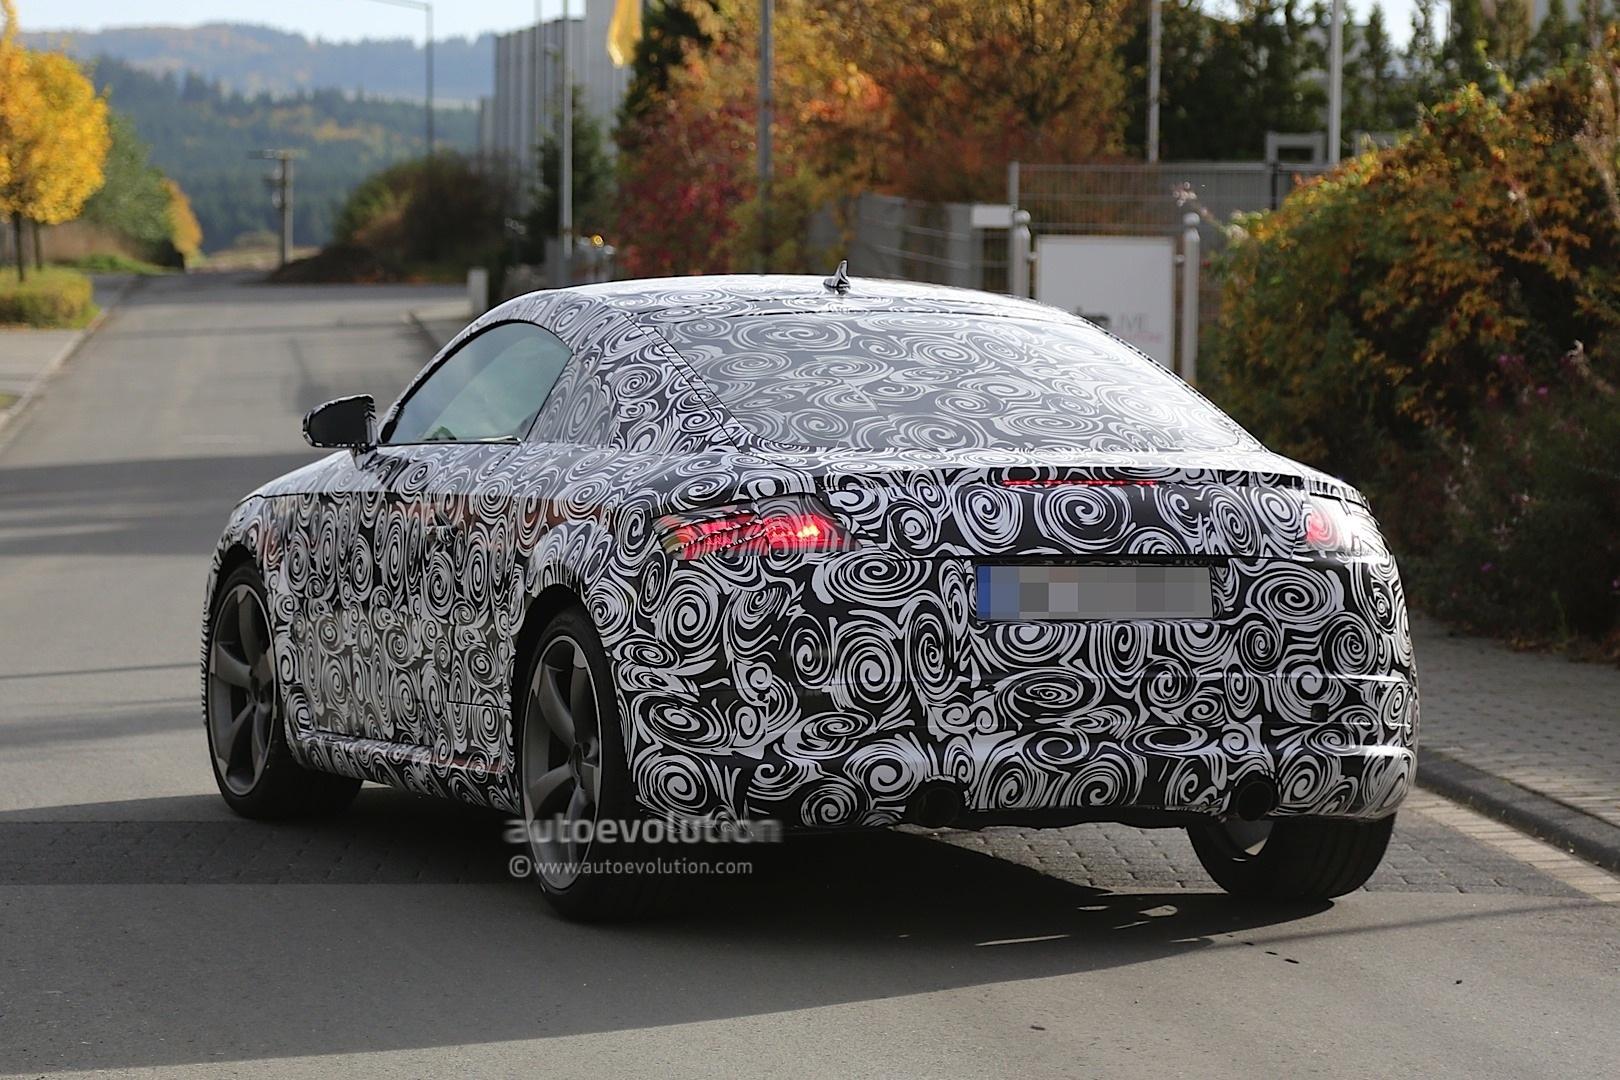 Spyshots: 2015 Audi TT Spotted in Germany - autoevolution